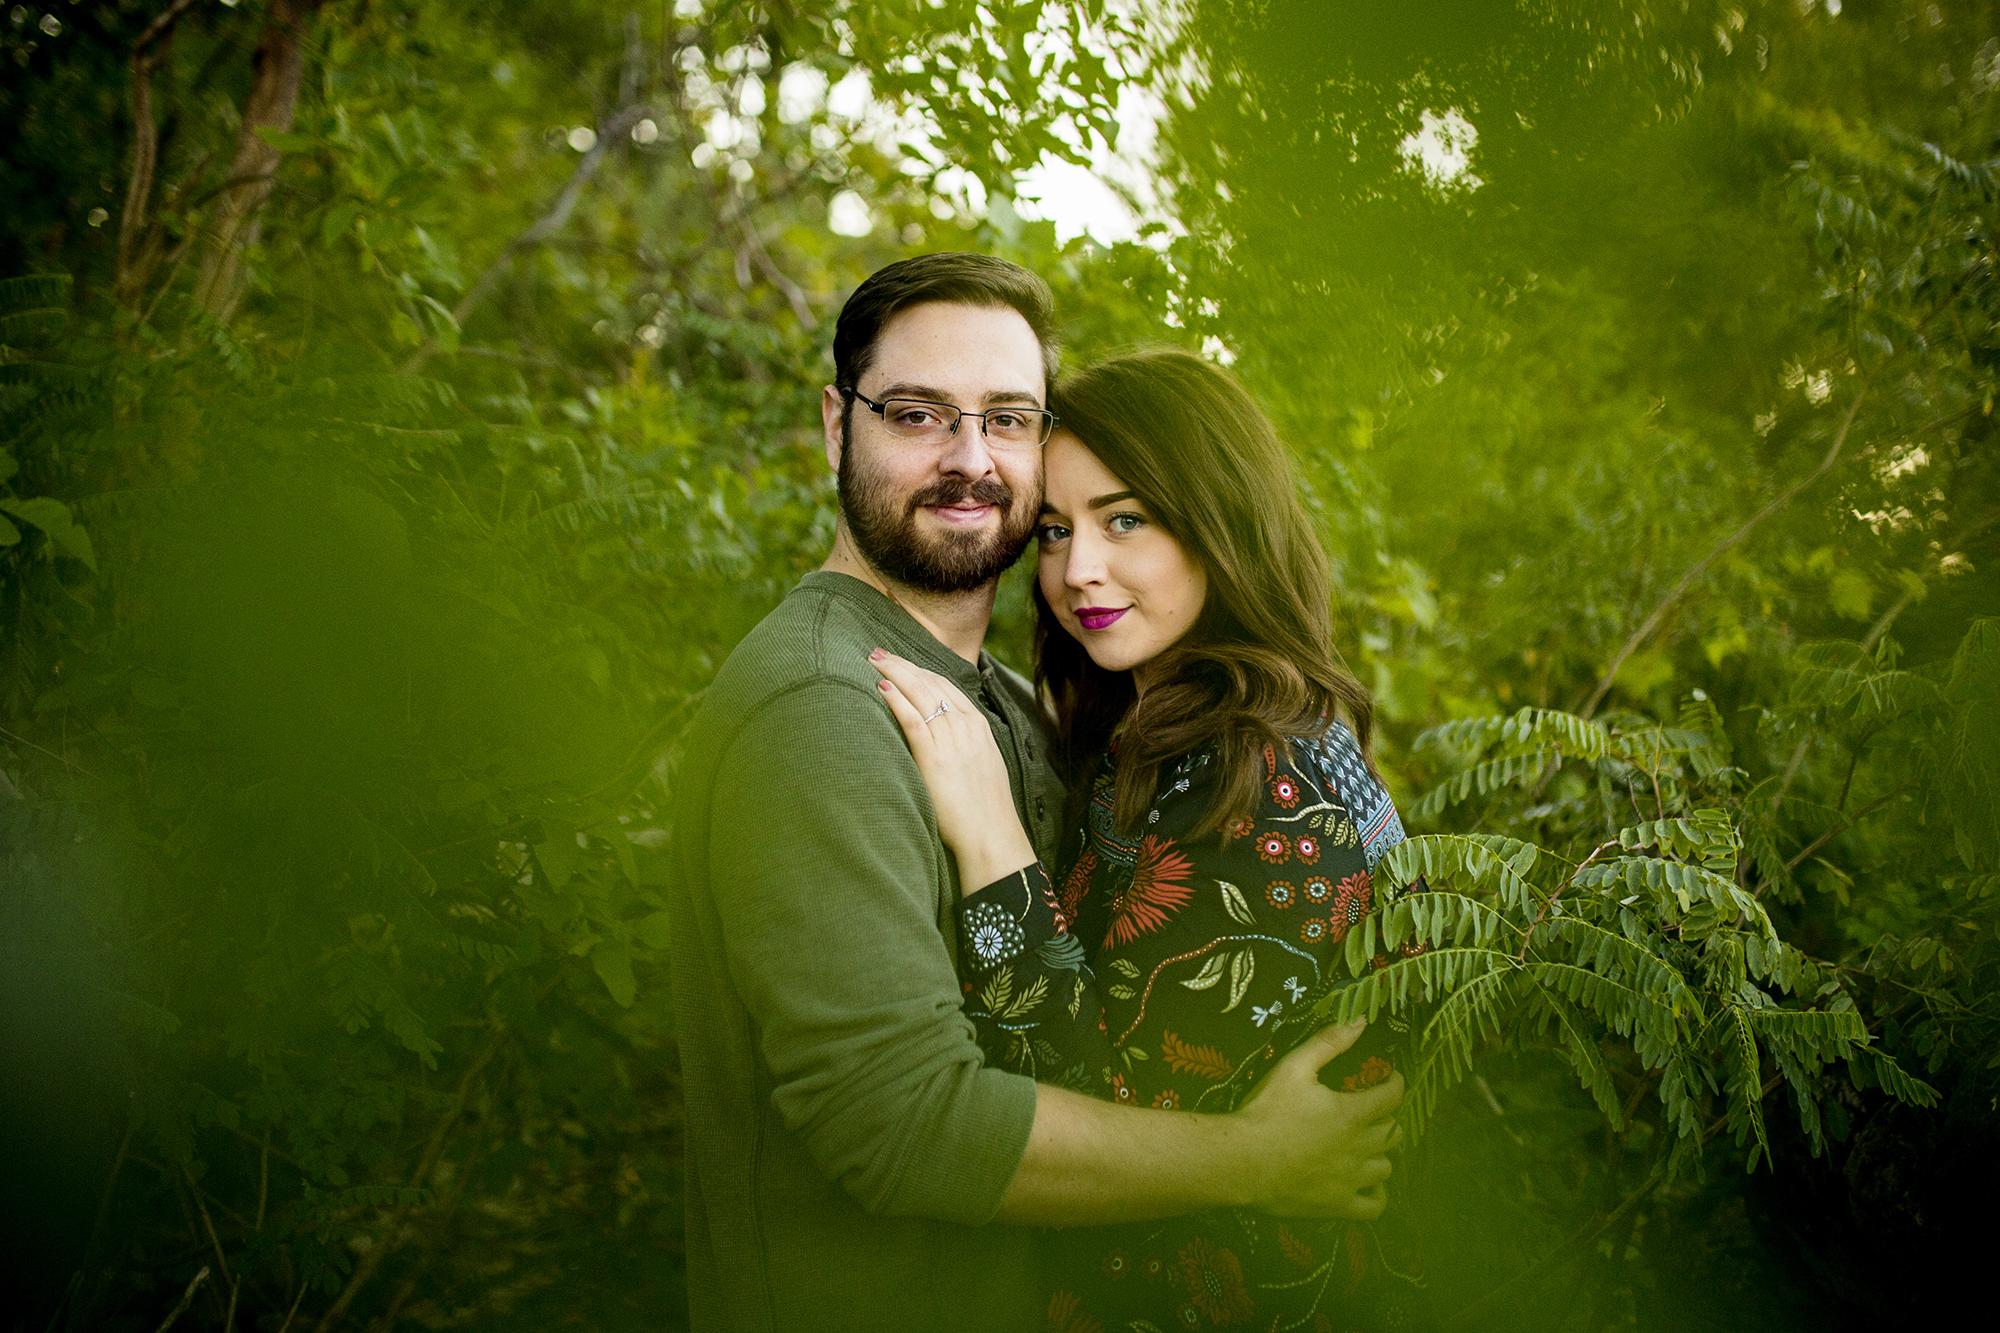 Seriously_Sabrina_Photography_Louisville_Kentucky_Engagement_Falls_of_Ohio_Seneca_Park_KarlMarlie23.jpg